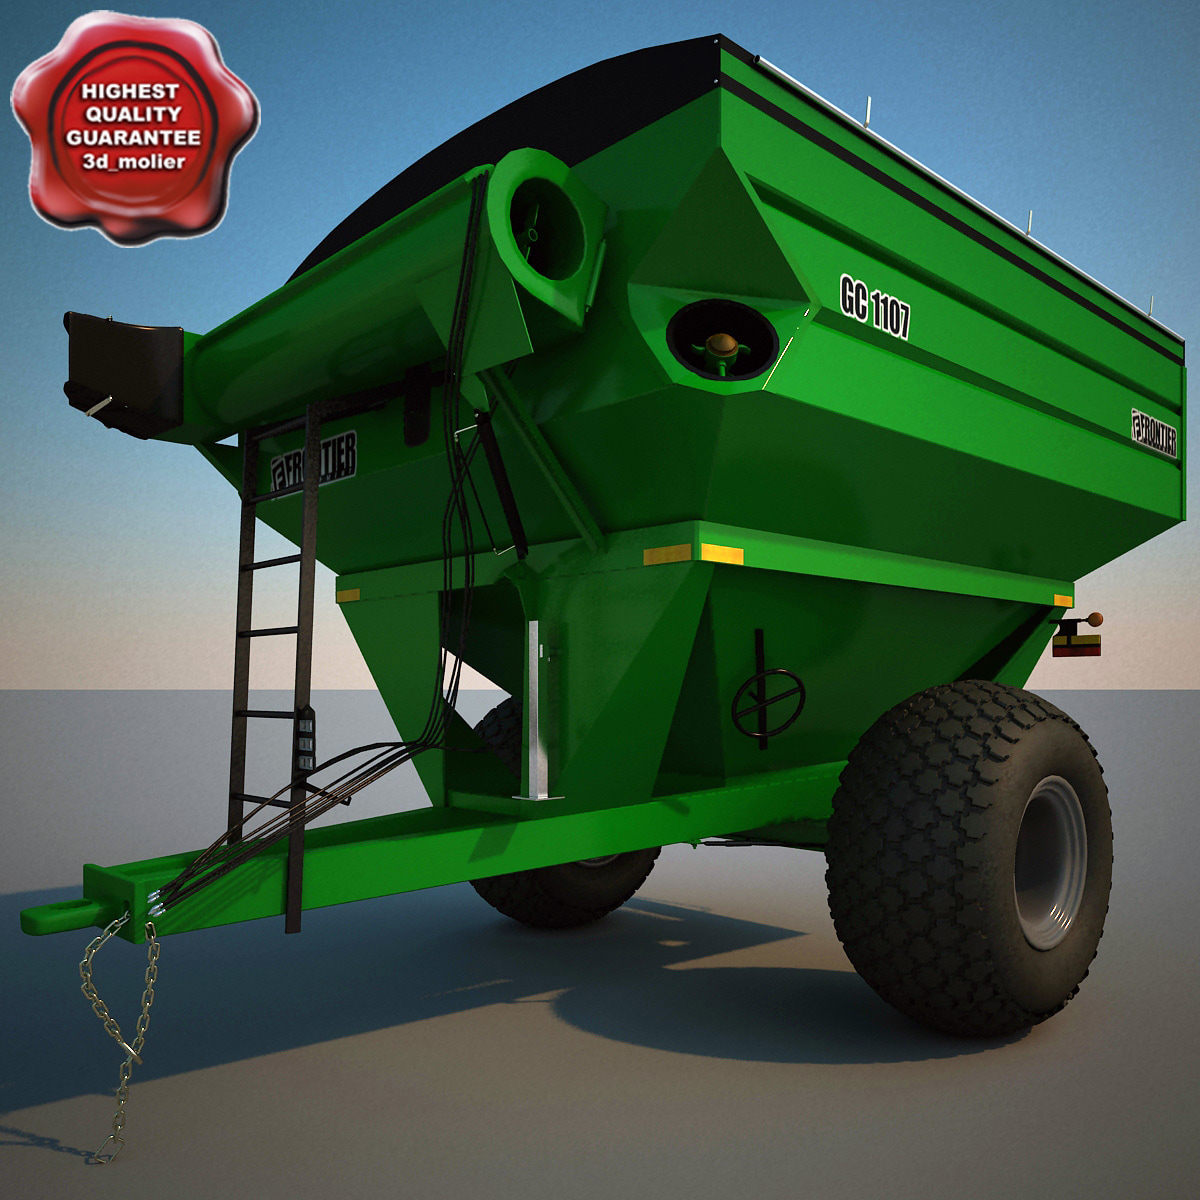 Farm_Grain_Cart_Frontier_GC1107_00.jpg